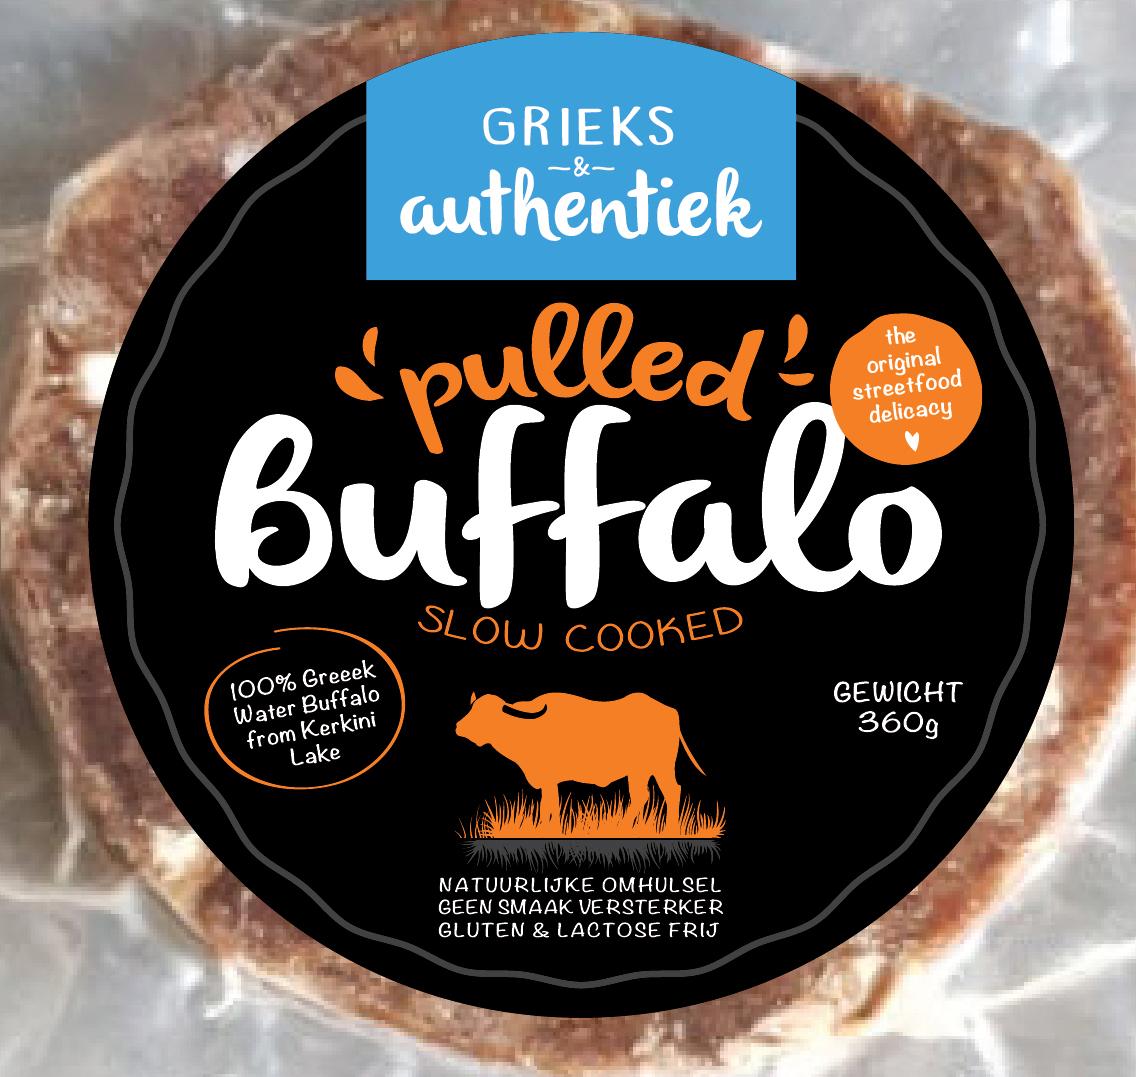 Grieks & Authentiek Pulled buffalo package